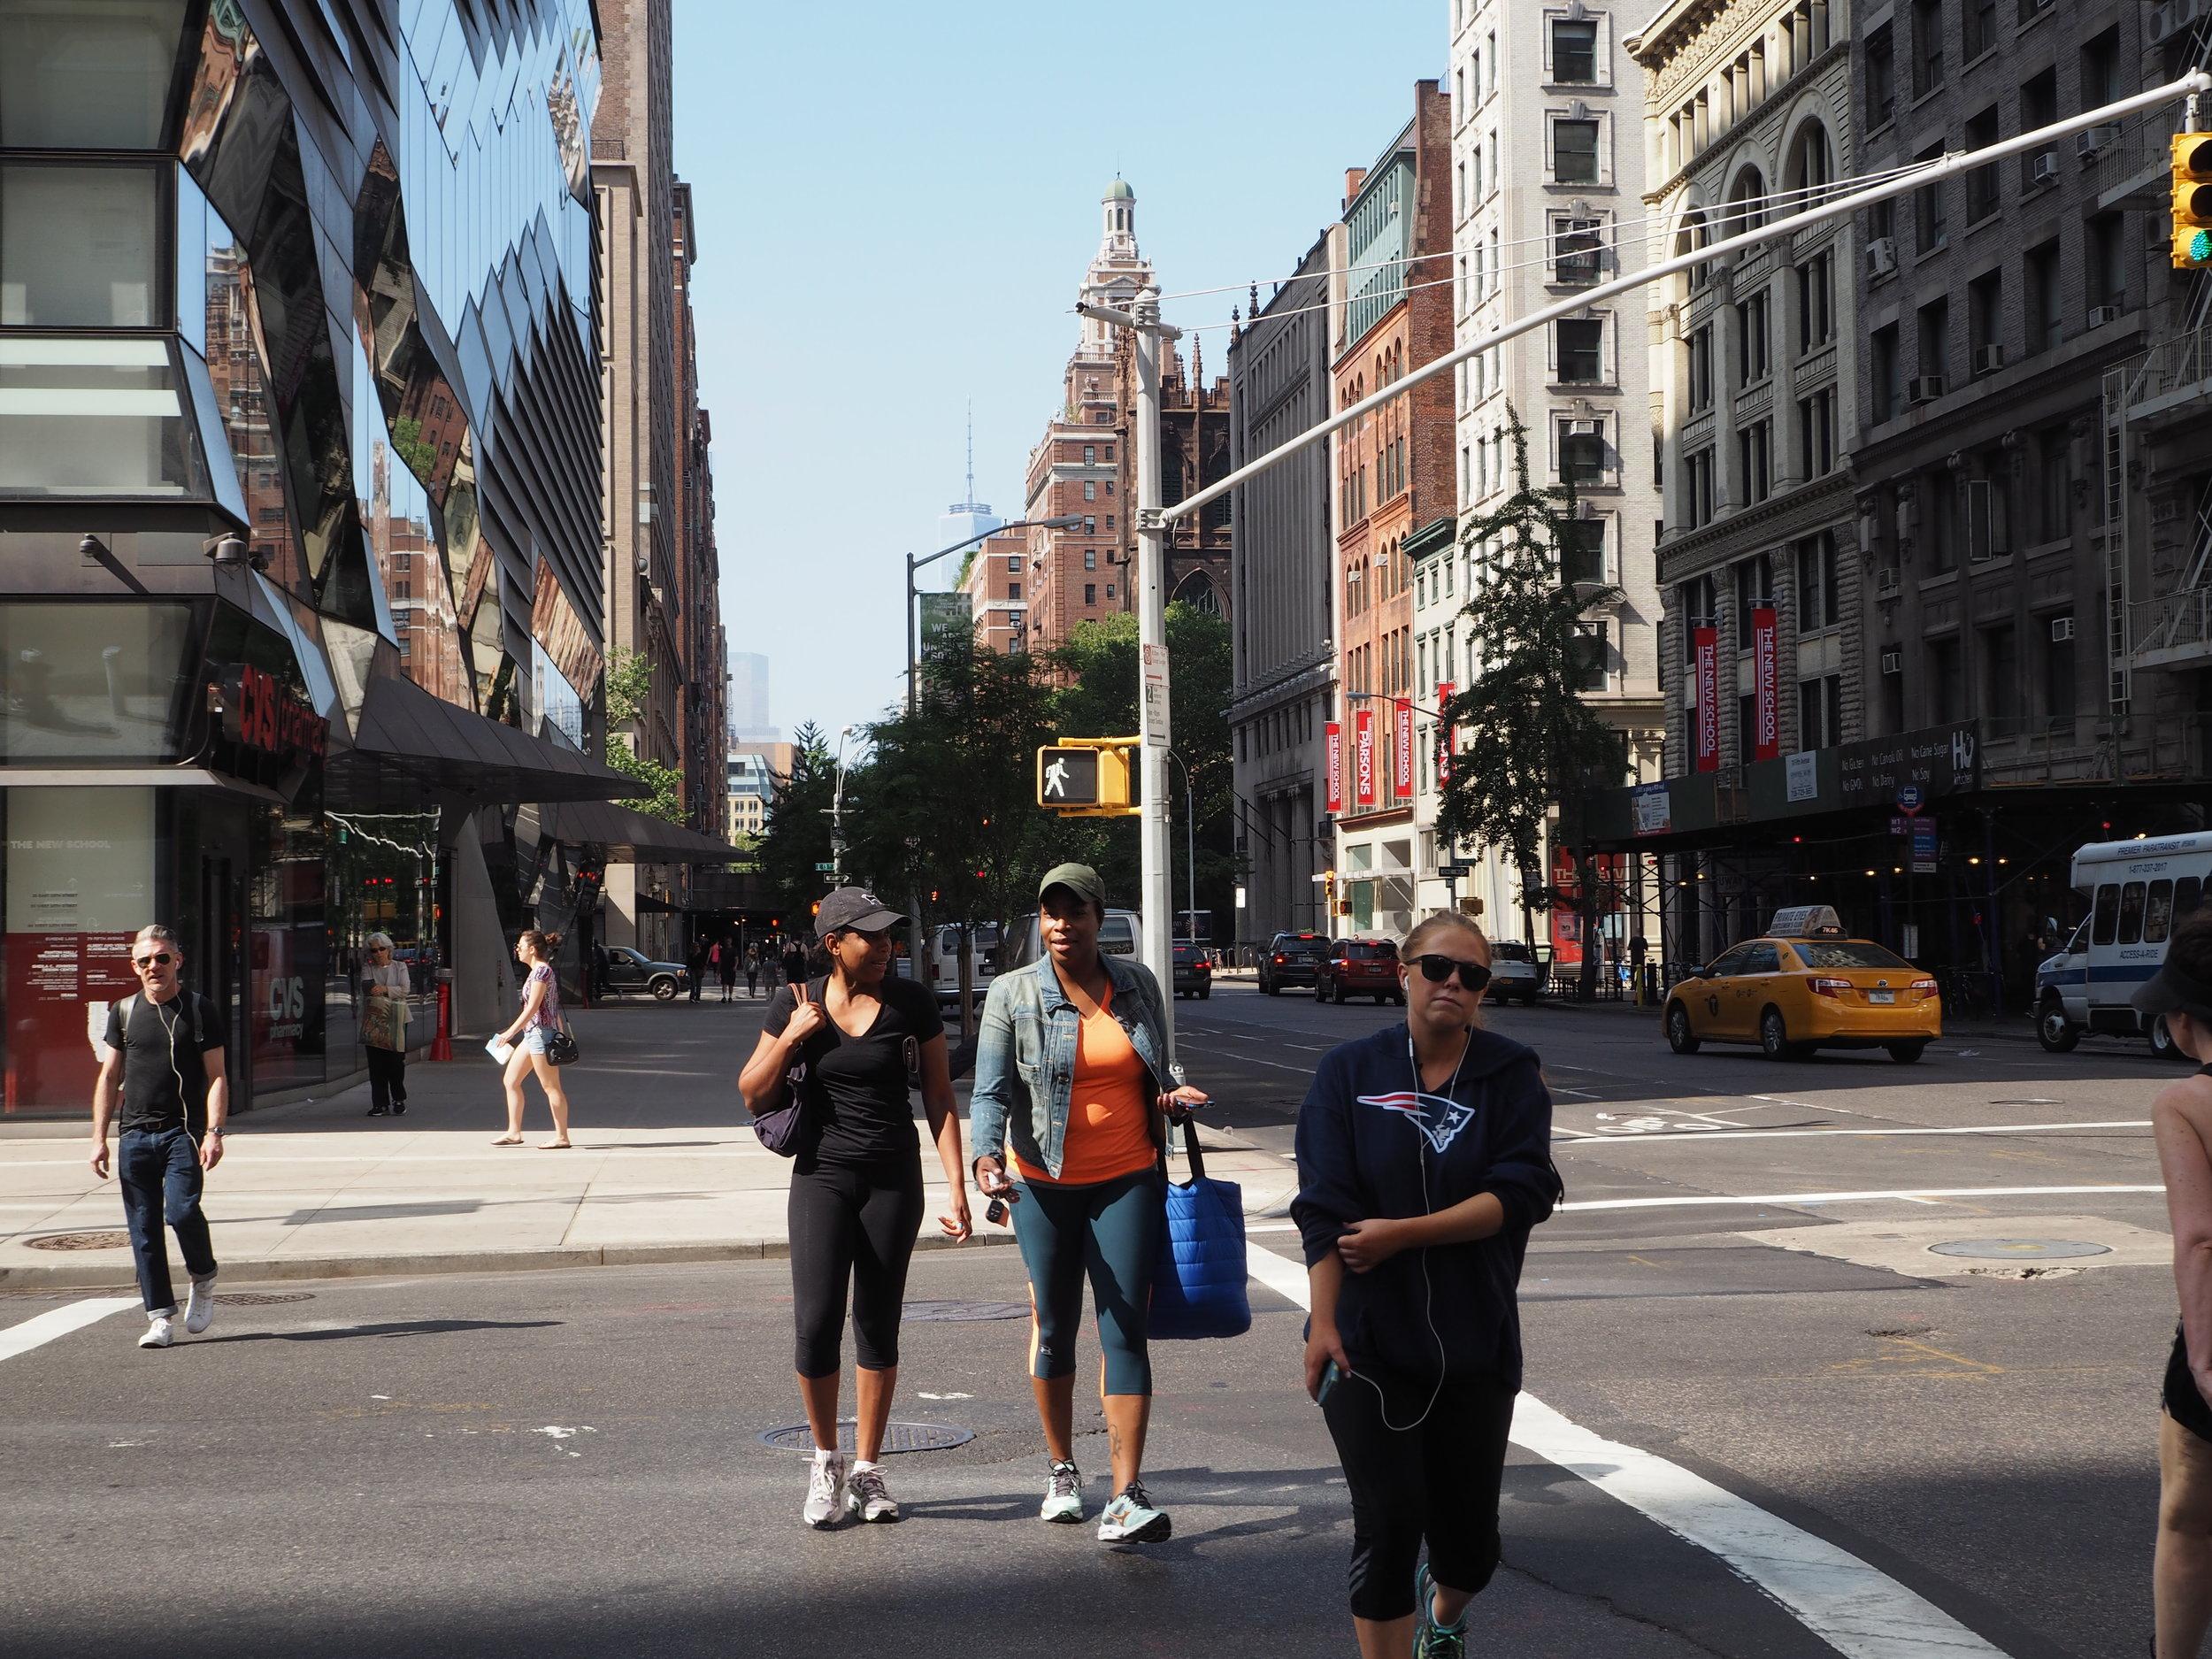 NYC_2015_0460 2.JPG